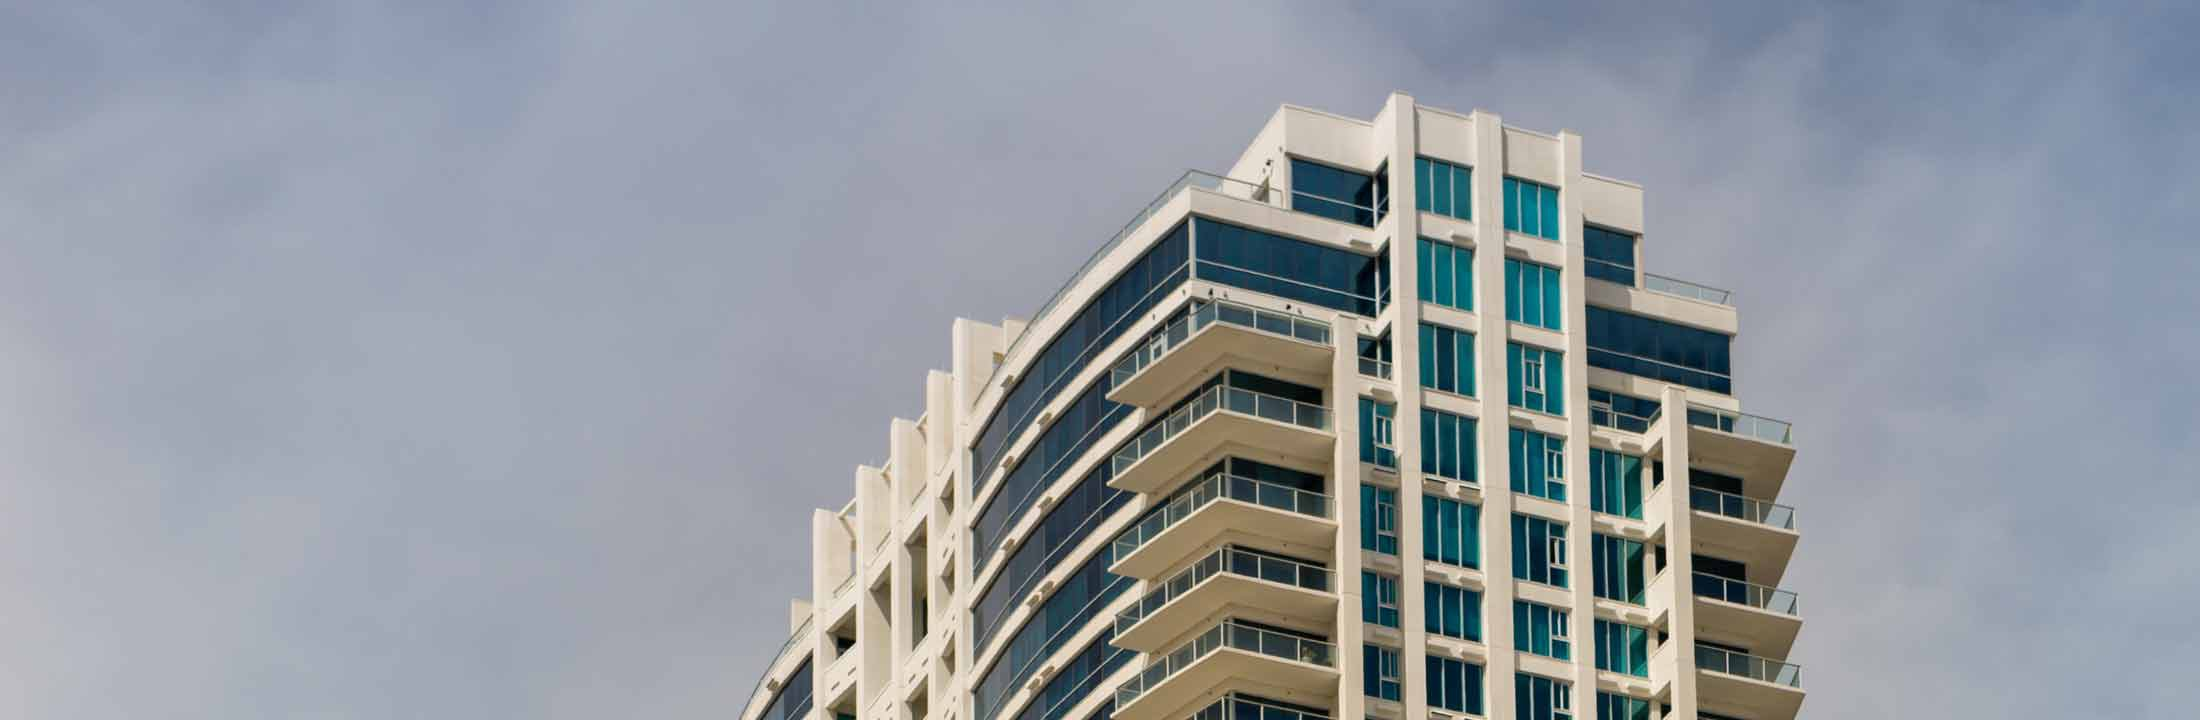 Sky-las-vegas-condos-for-sale-LV-highrise-residences